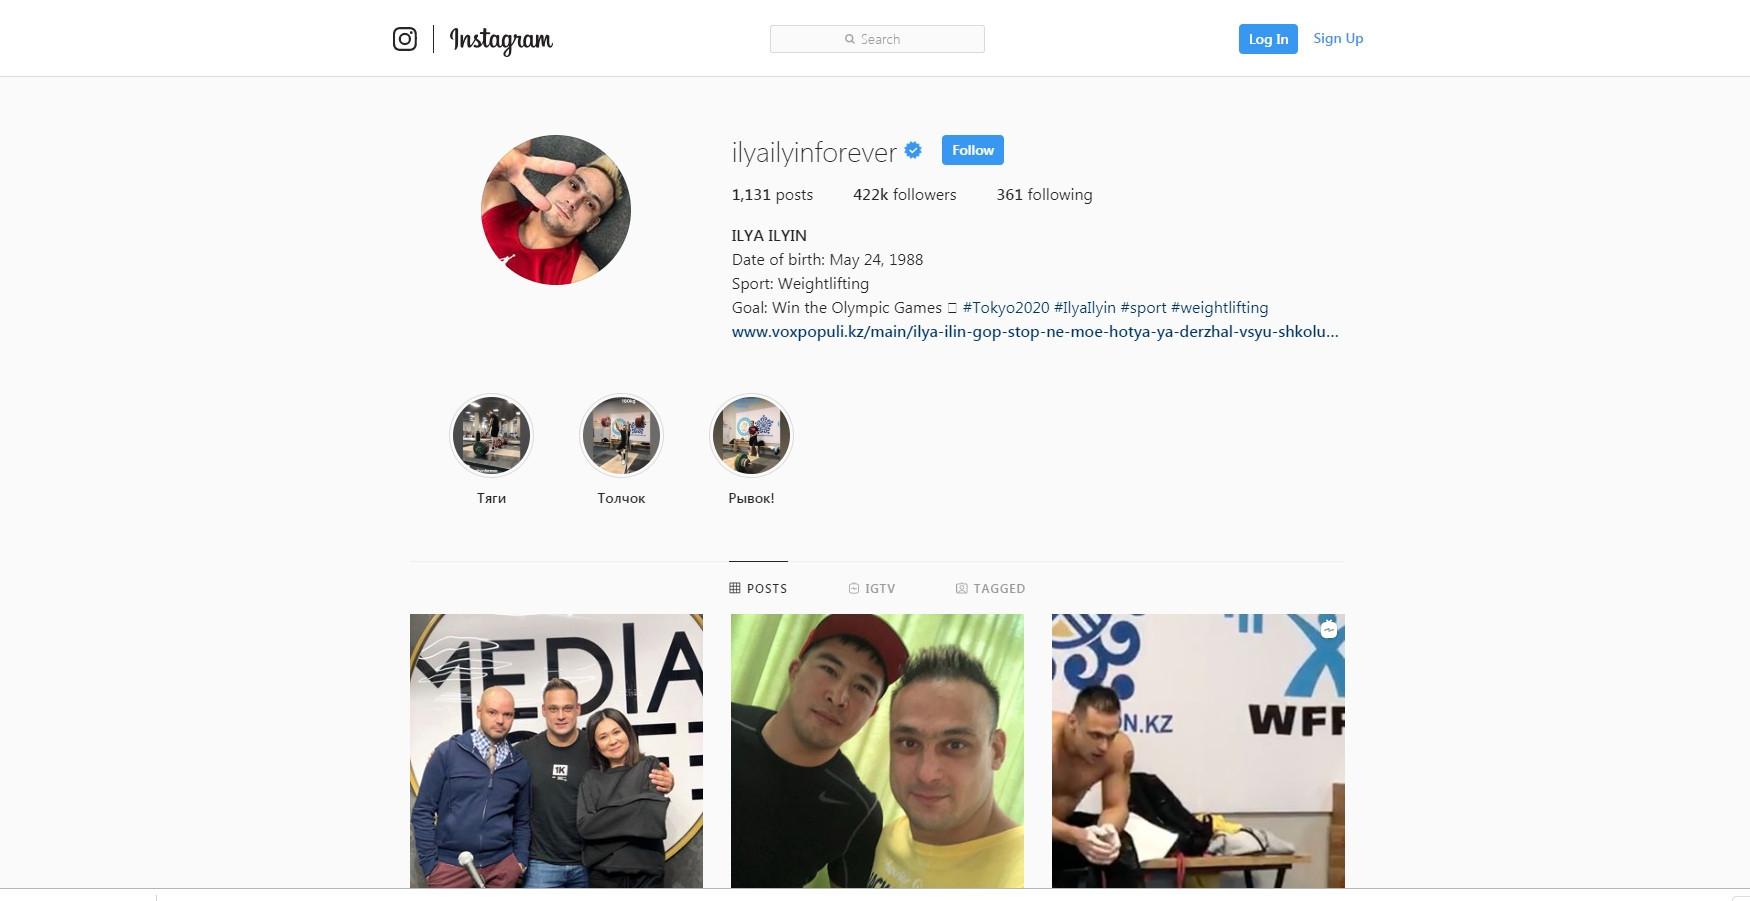 Ilya Ilyin is popular on social media, with nearly half-a-million followers on Instagram ©Instagram